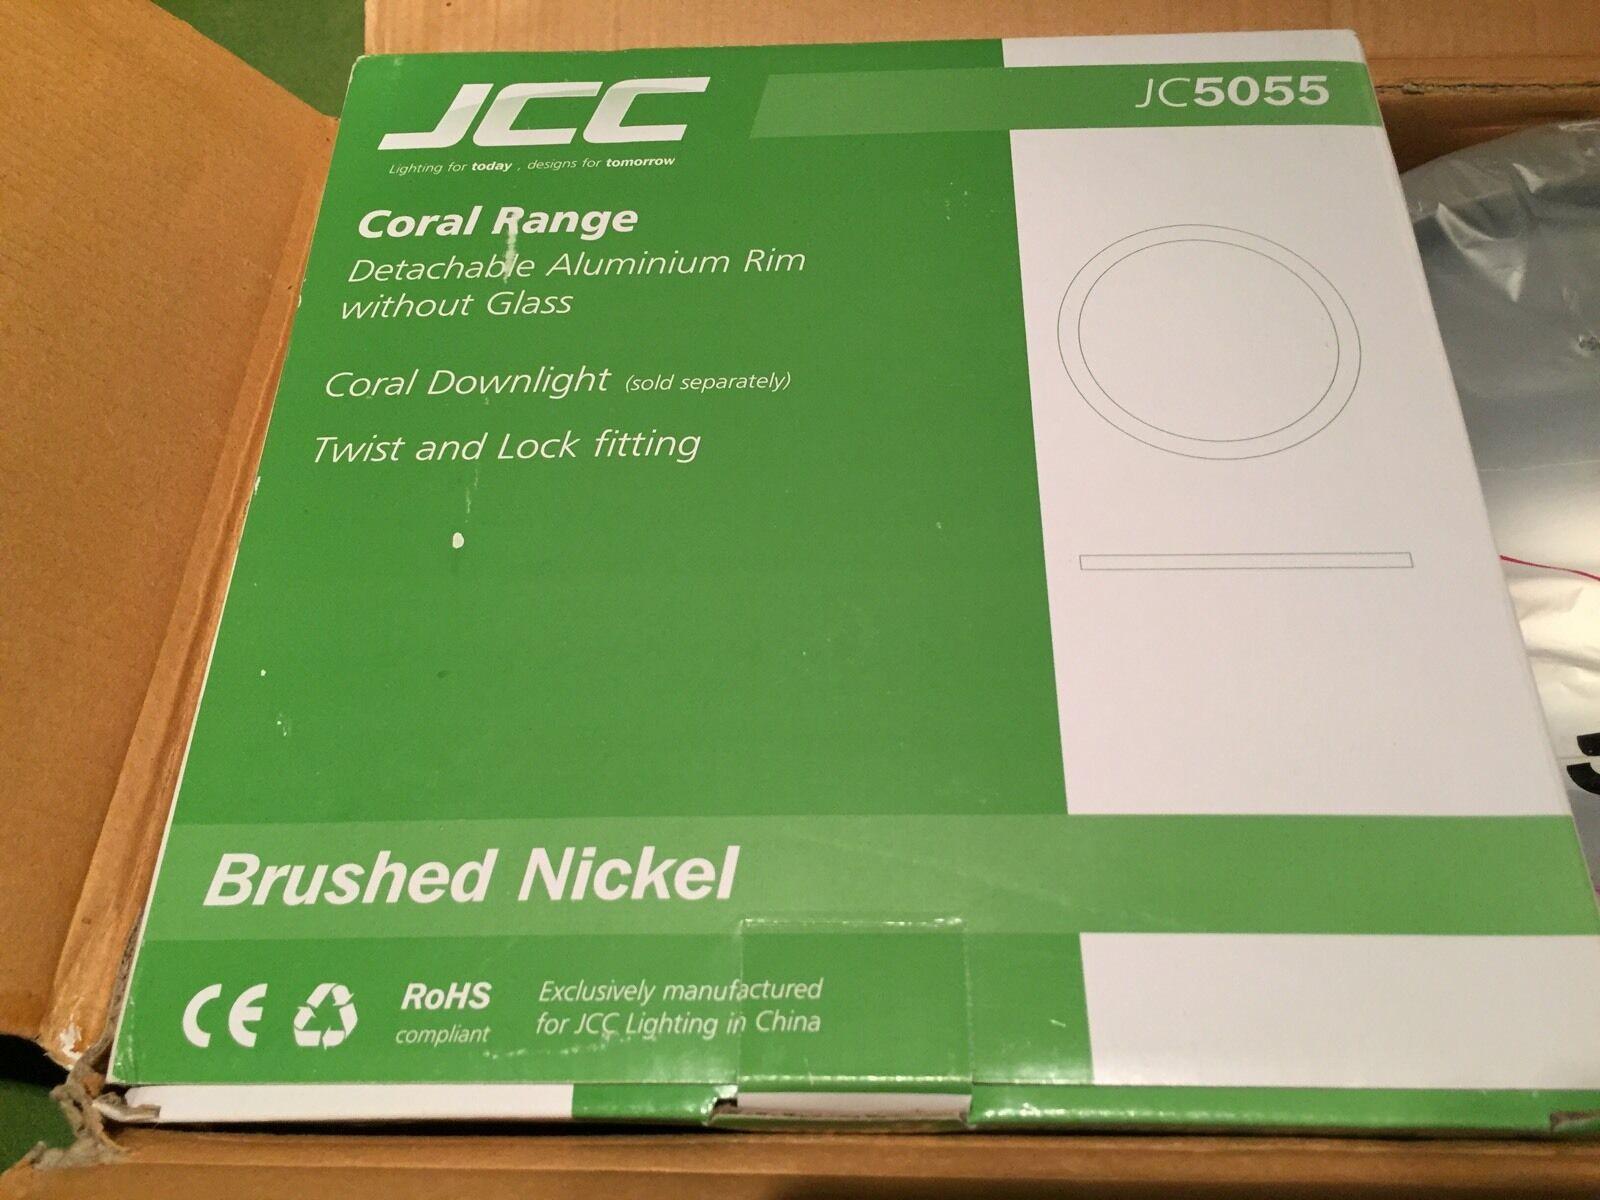 JCC Lighting Coral Downlight Rim JC5055 Brushed Nickel Aluminium Light Rim